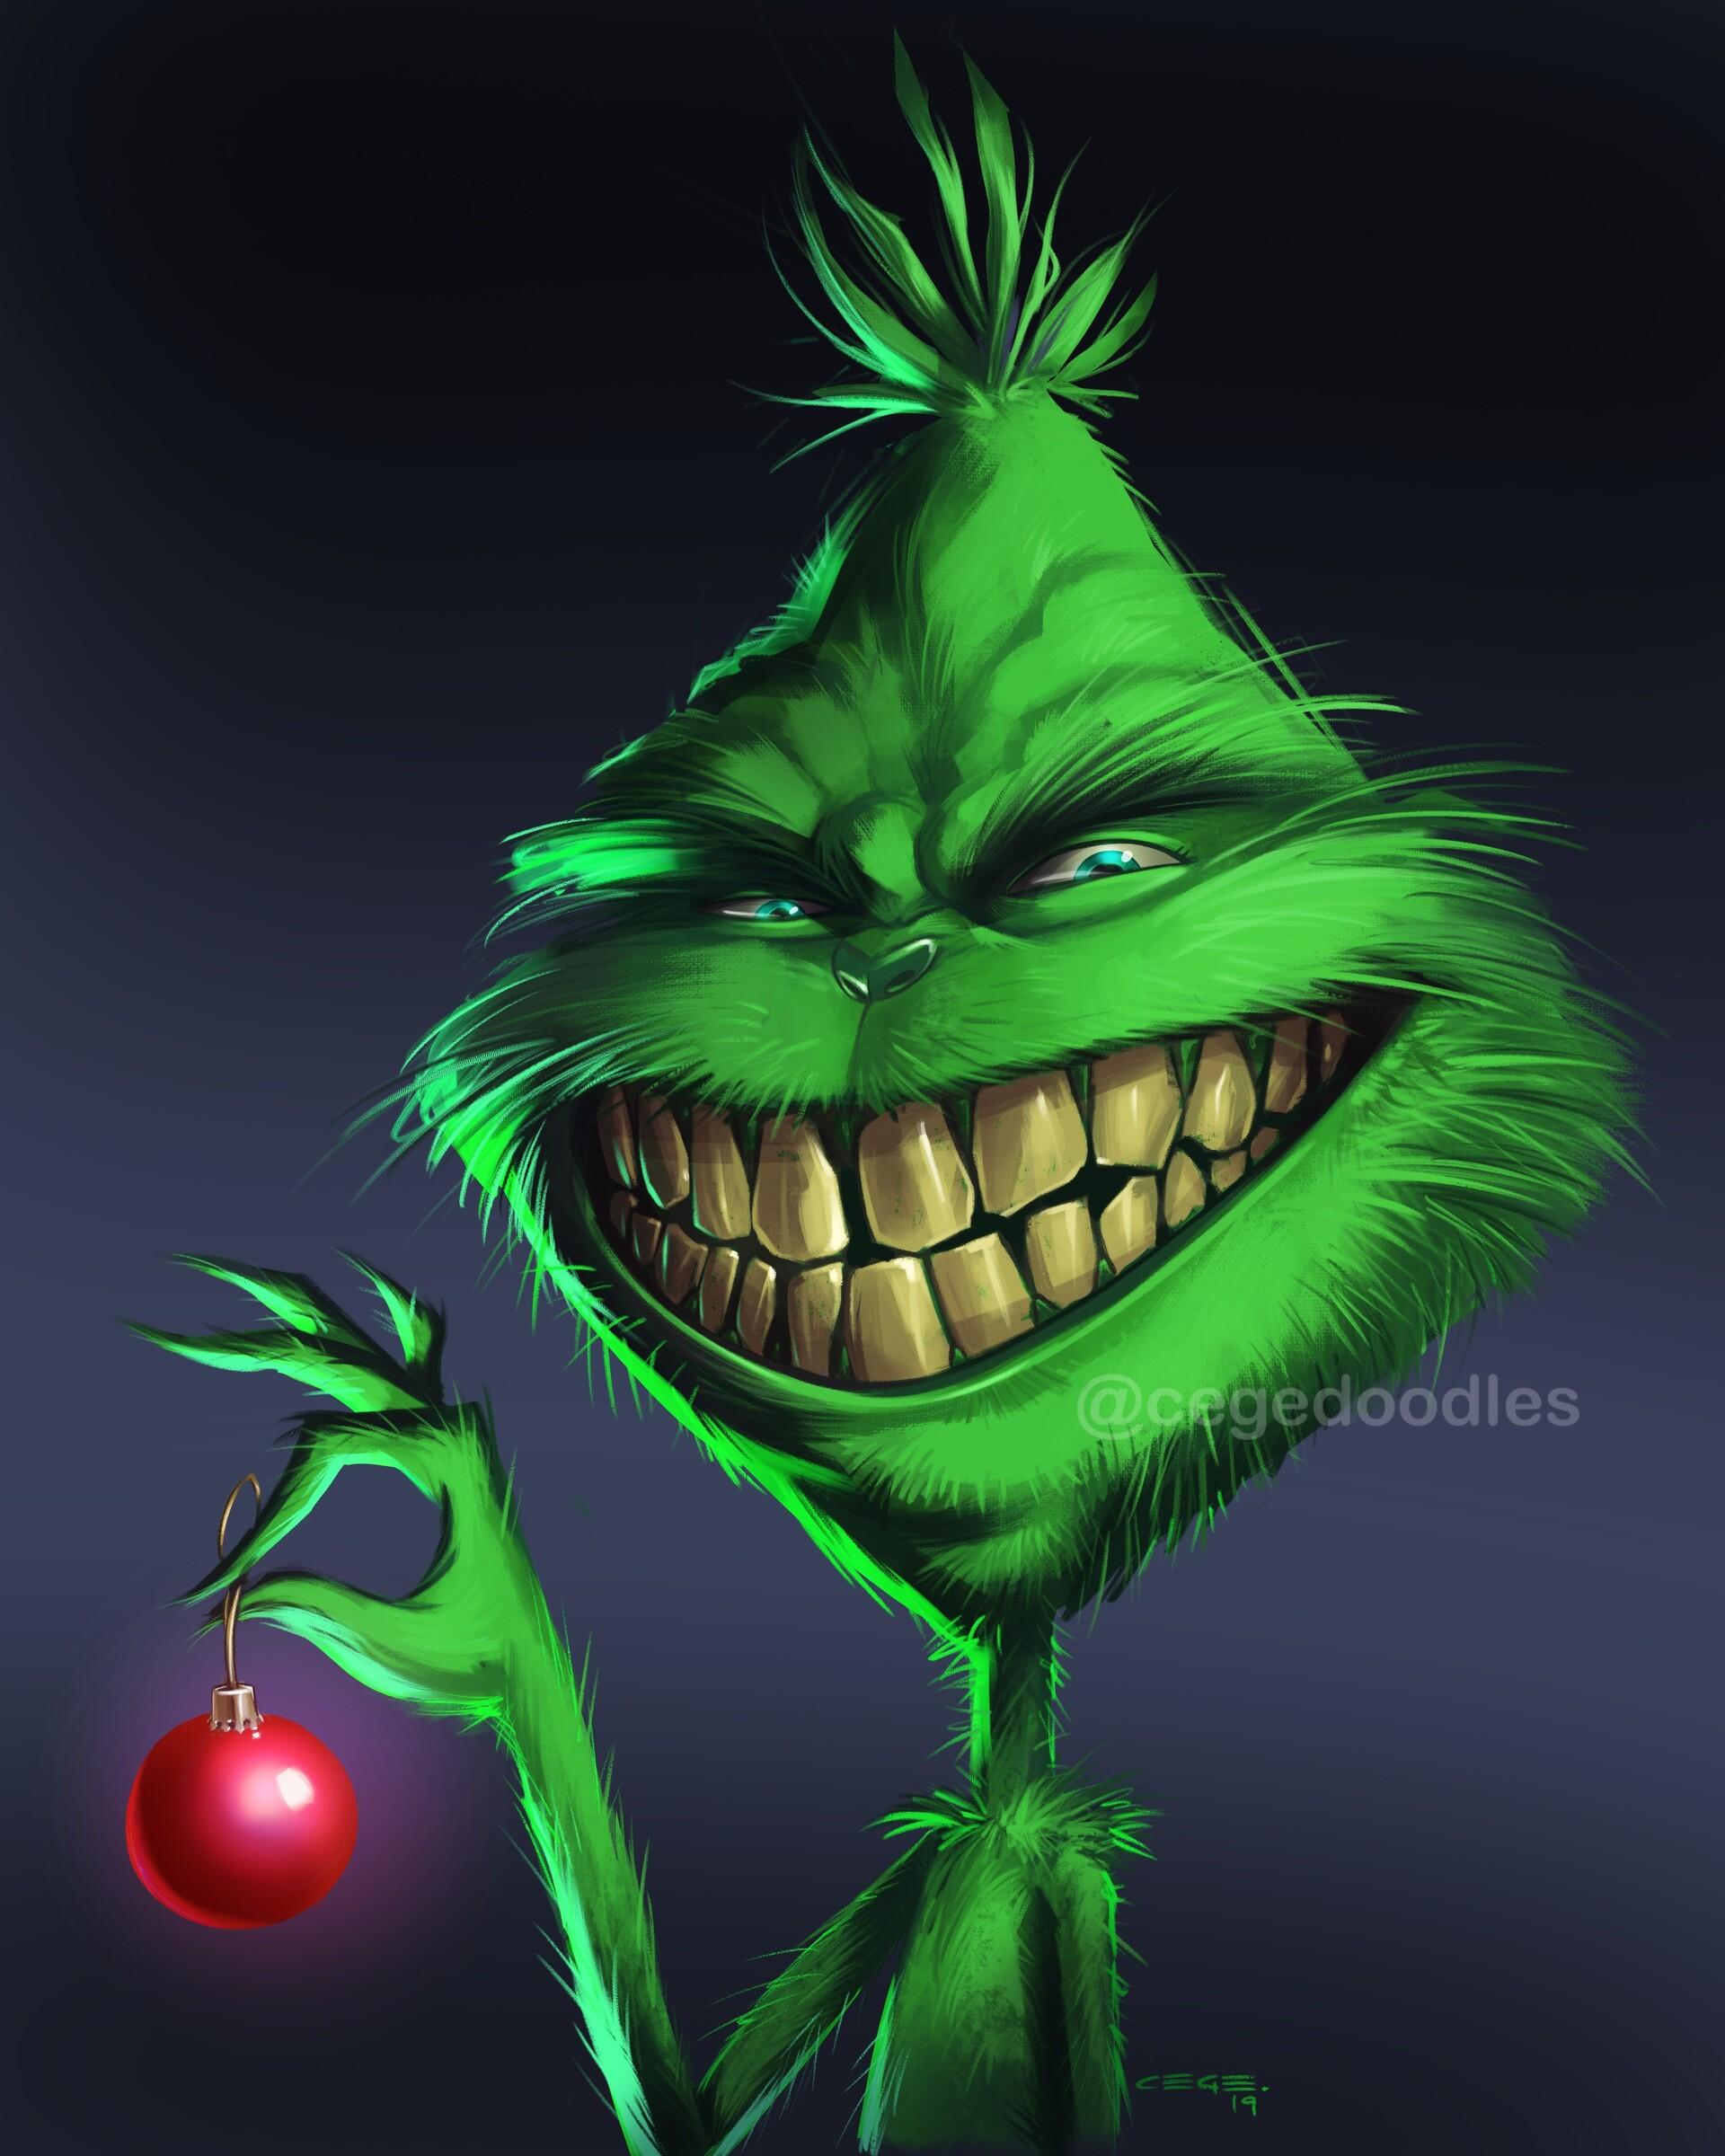 Grinch Smiling : grinch, smiling, Grinch, Smile